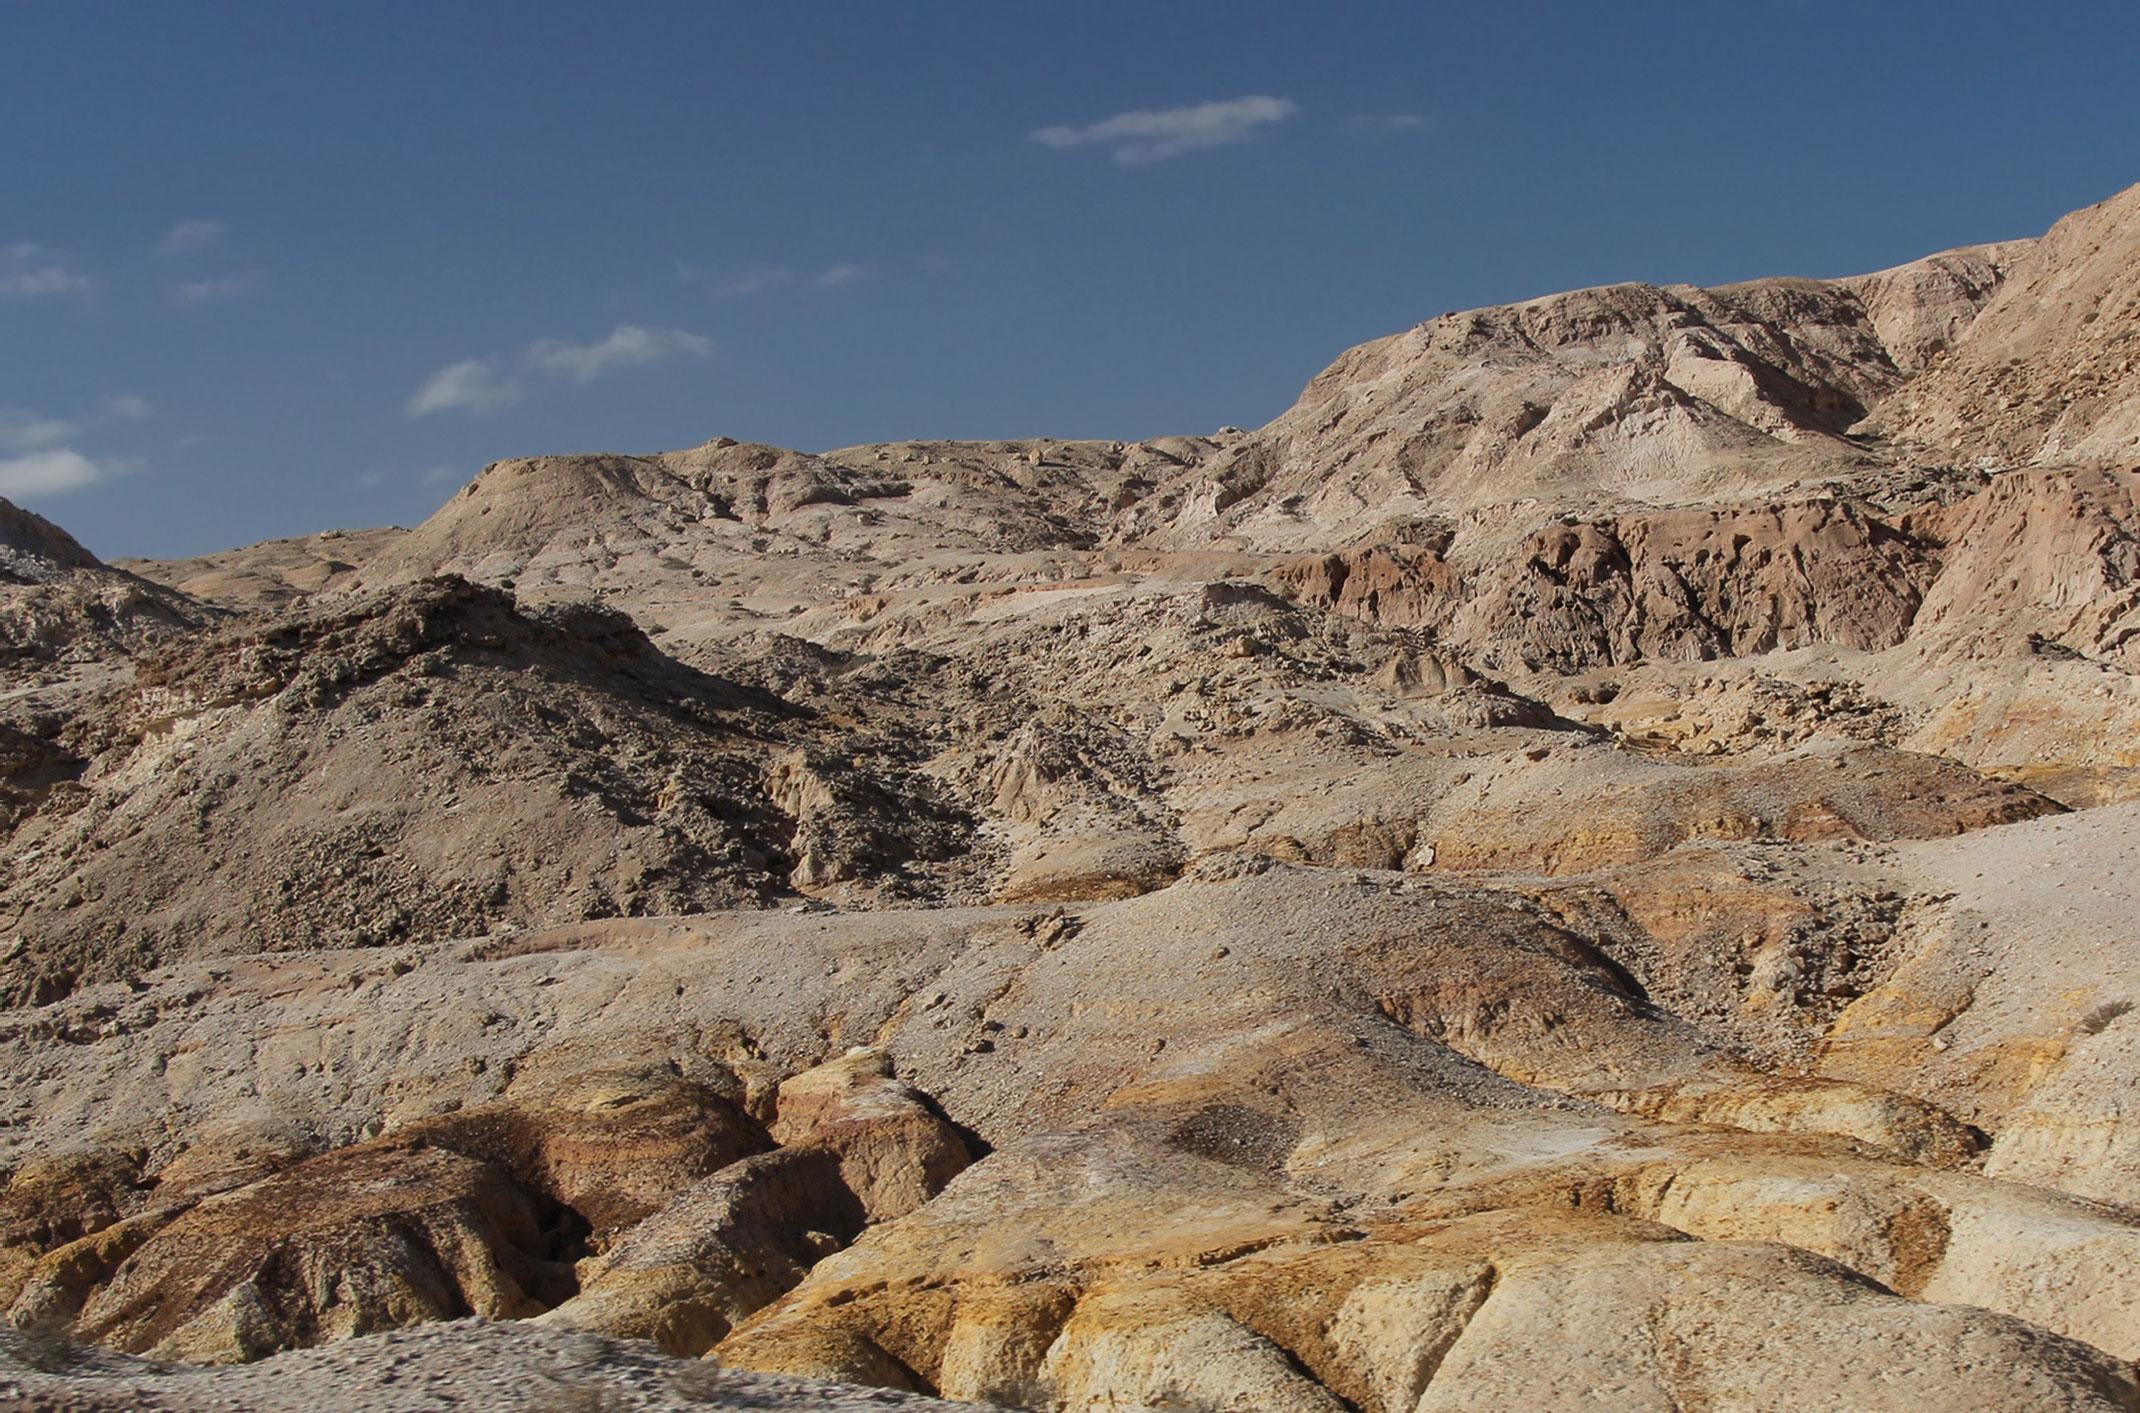 Sahara Zachodnia. Laayoune-Sakia el Hamra.Jraifia - Village de Pêche Oued Kraa